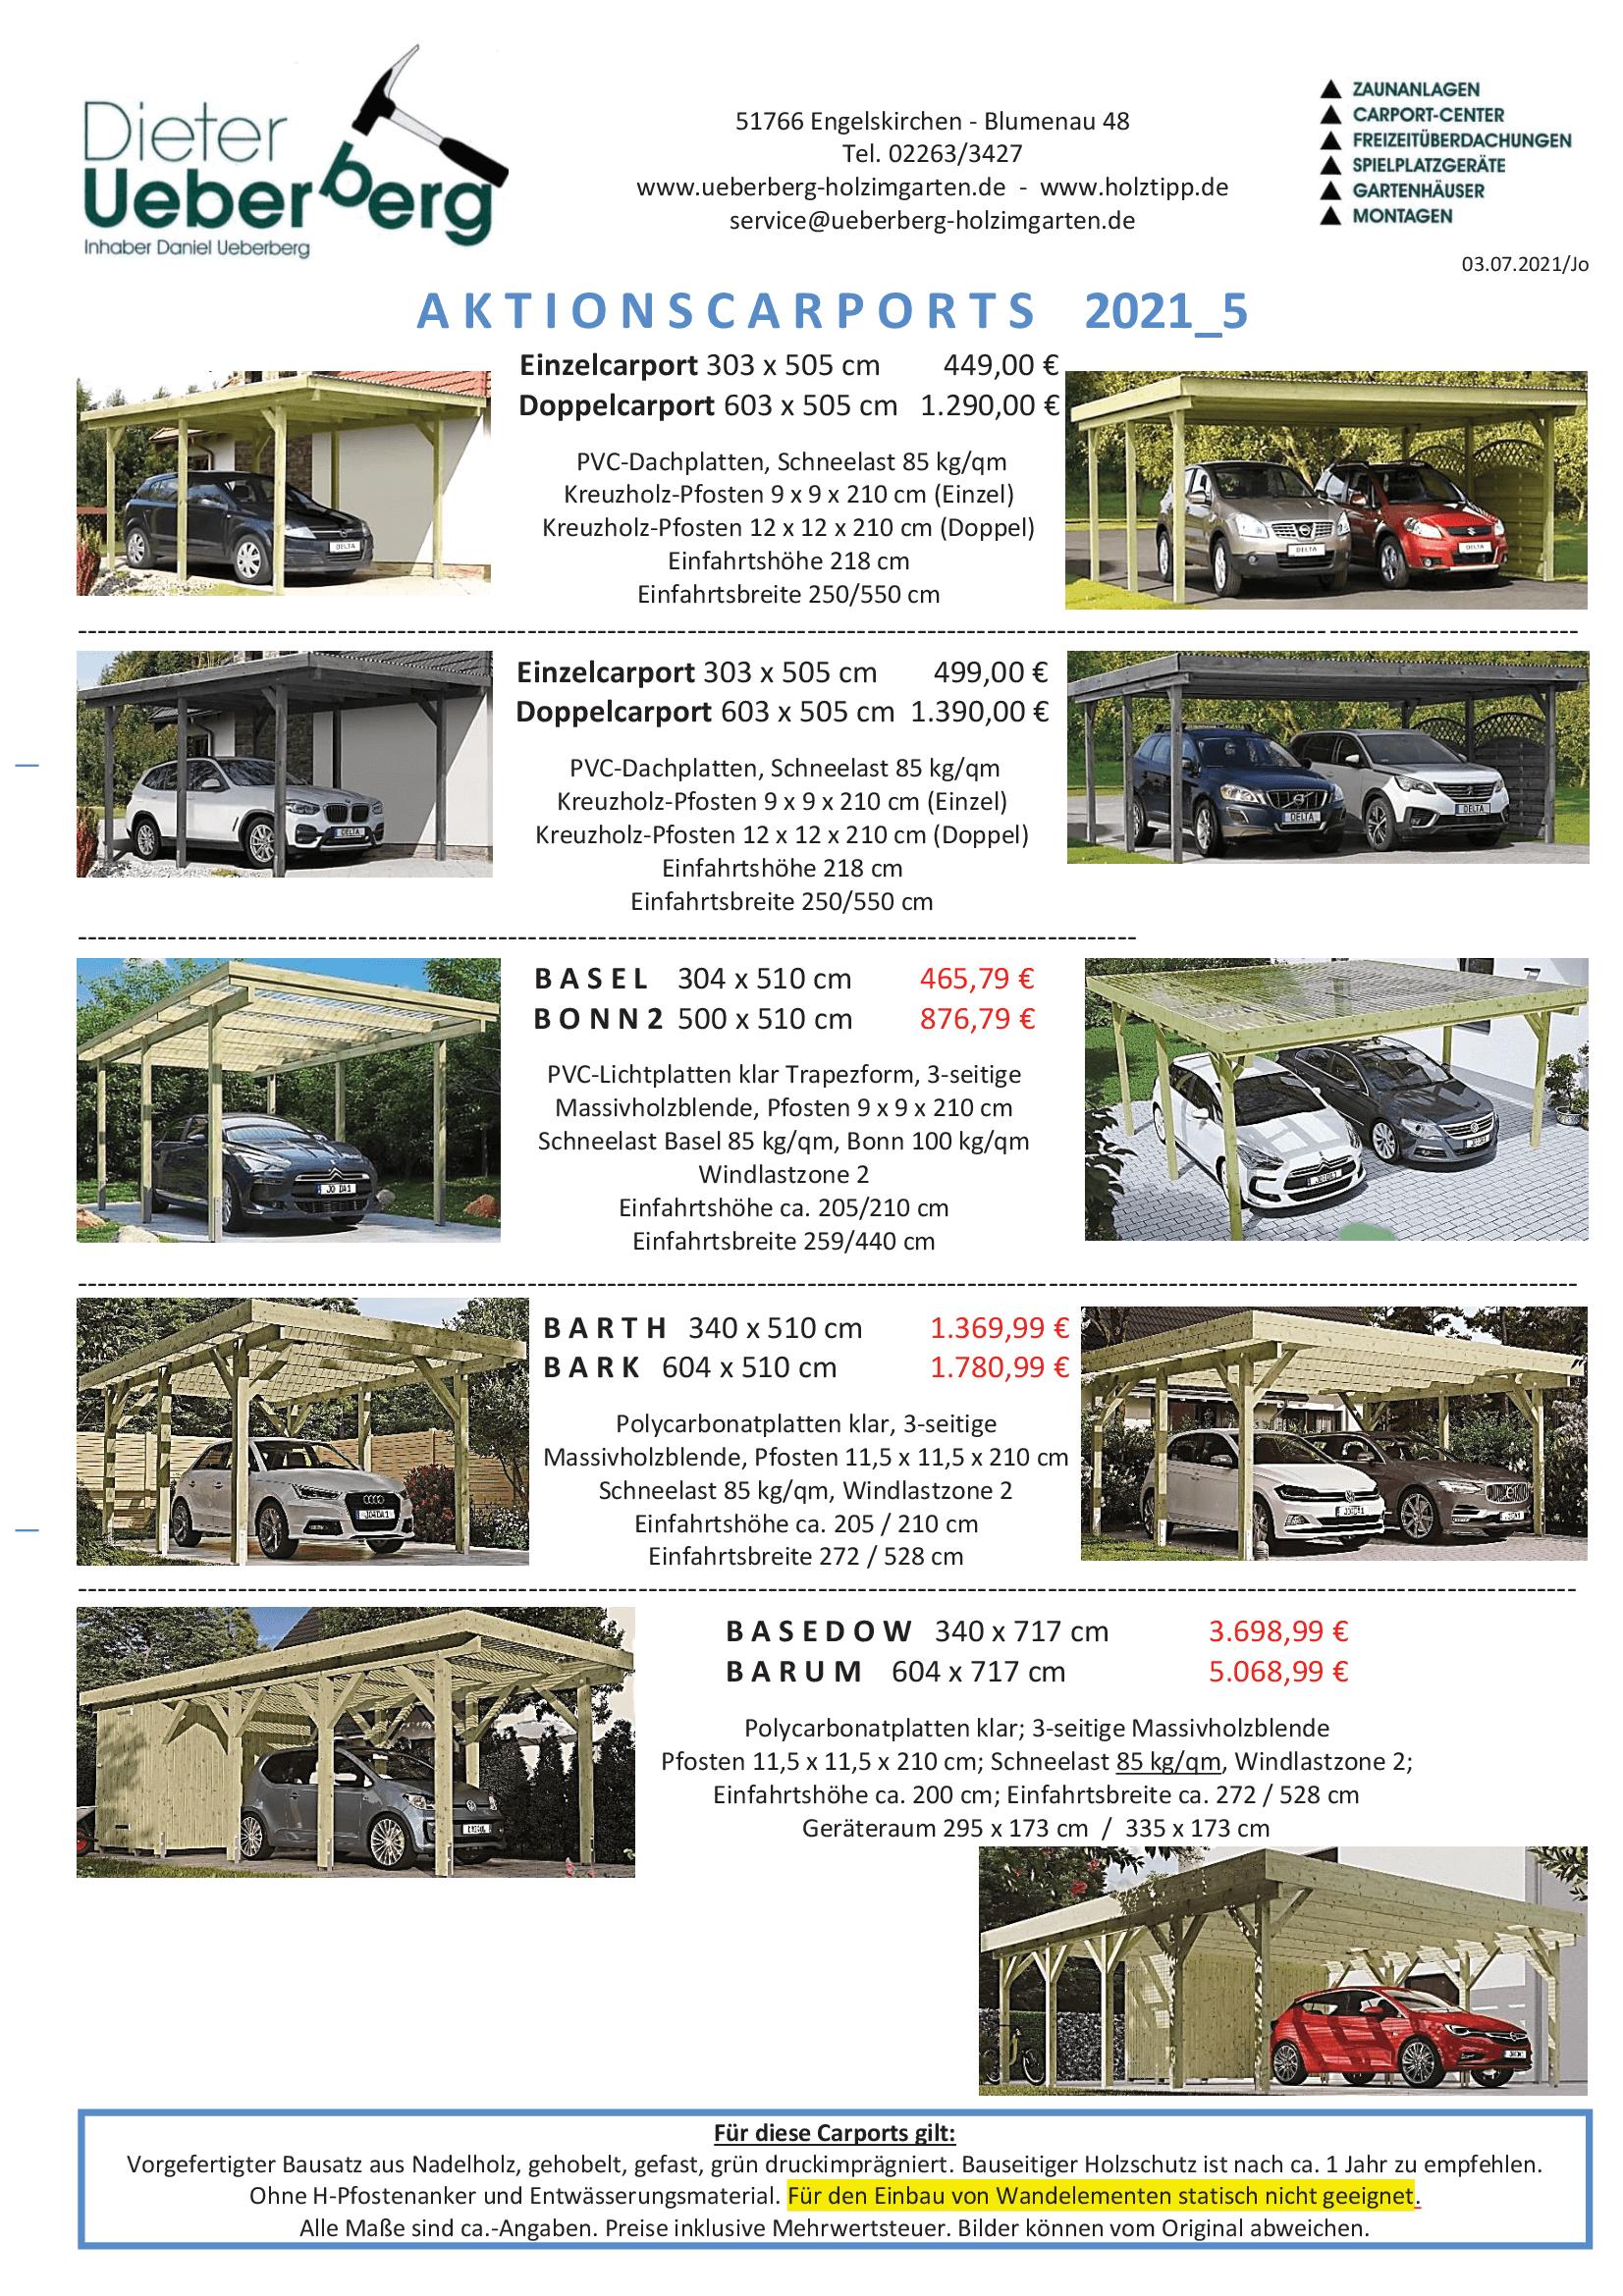 Carport Aktionen Ueberberg 2021_5